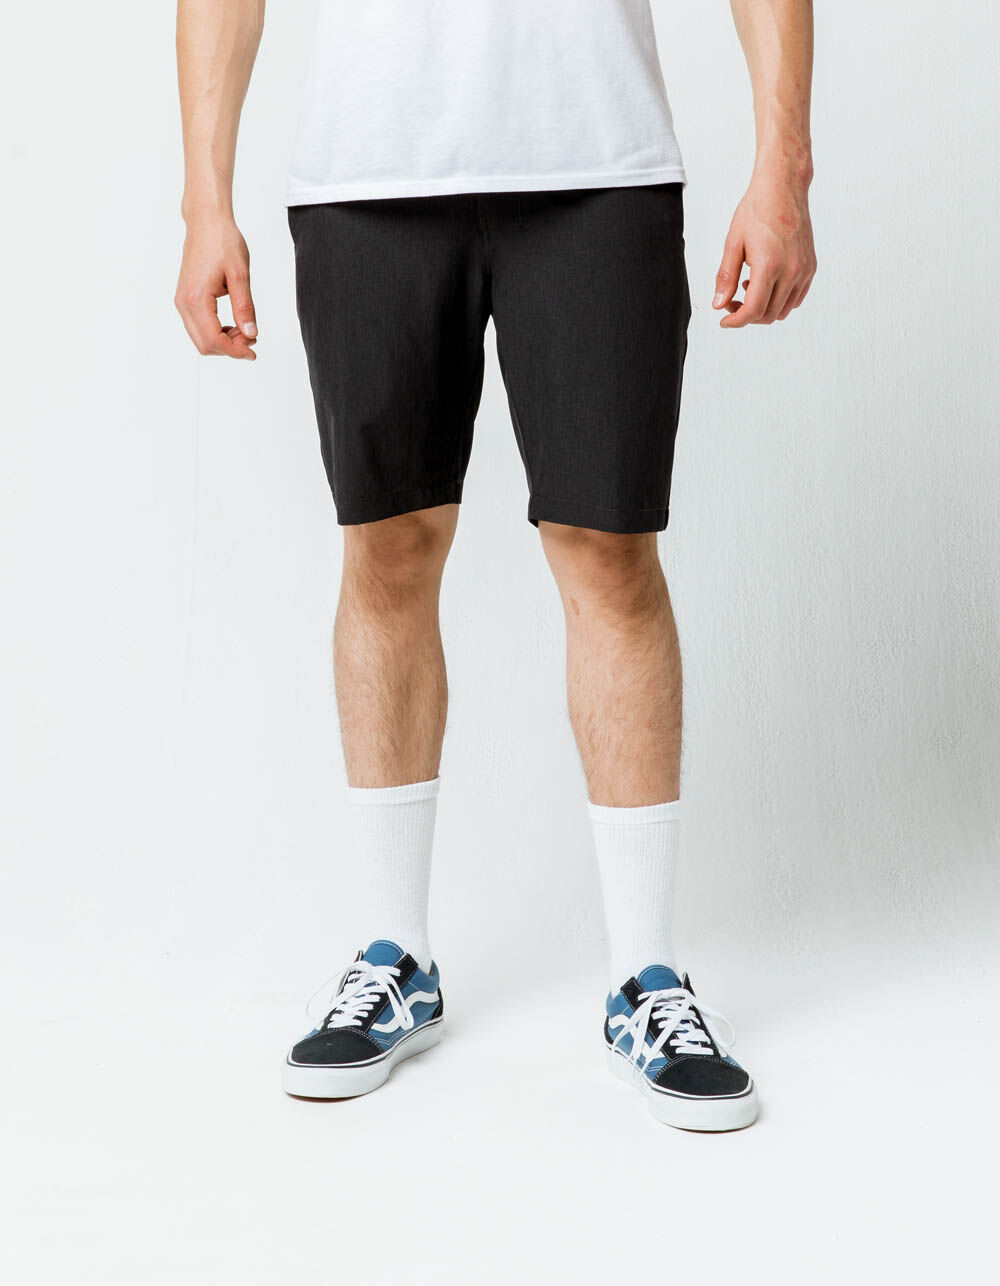 NITROUS BLACK Format Black Hybrid Shorts